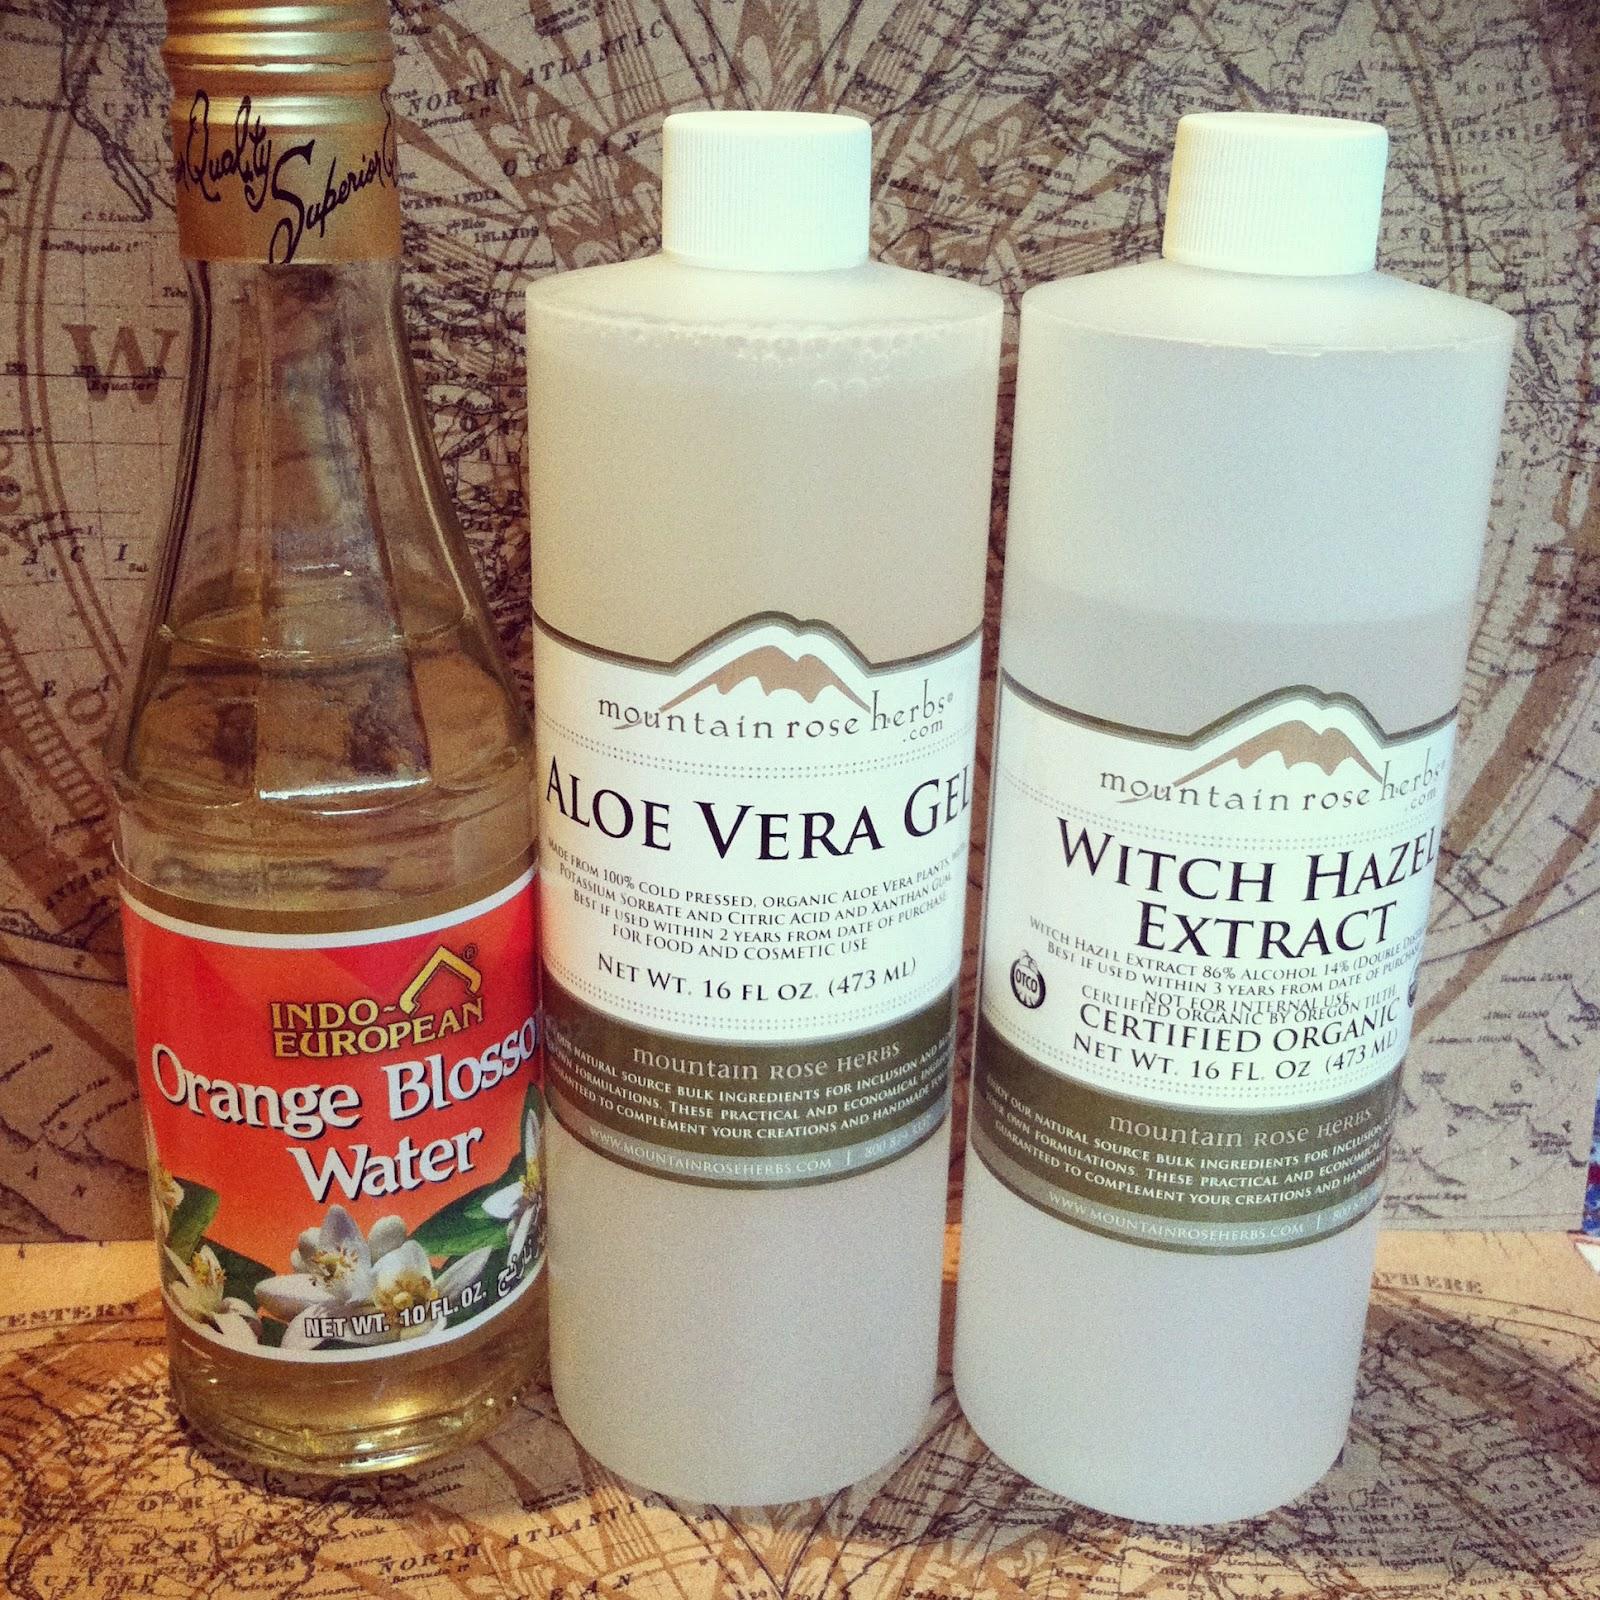 Excellent oily skin facial witch hazel aloe vera toner recipe sorry